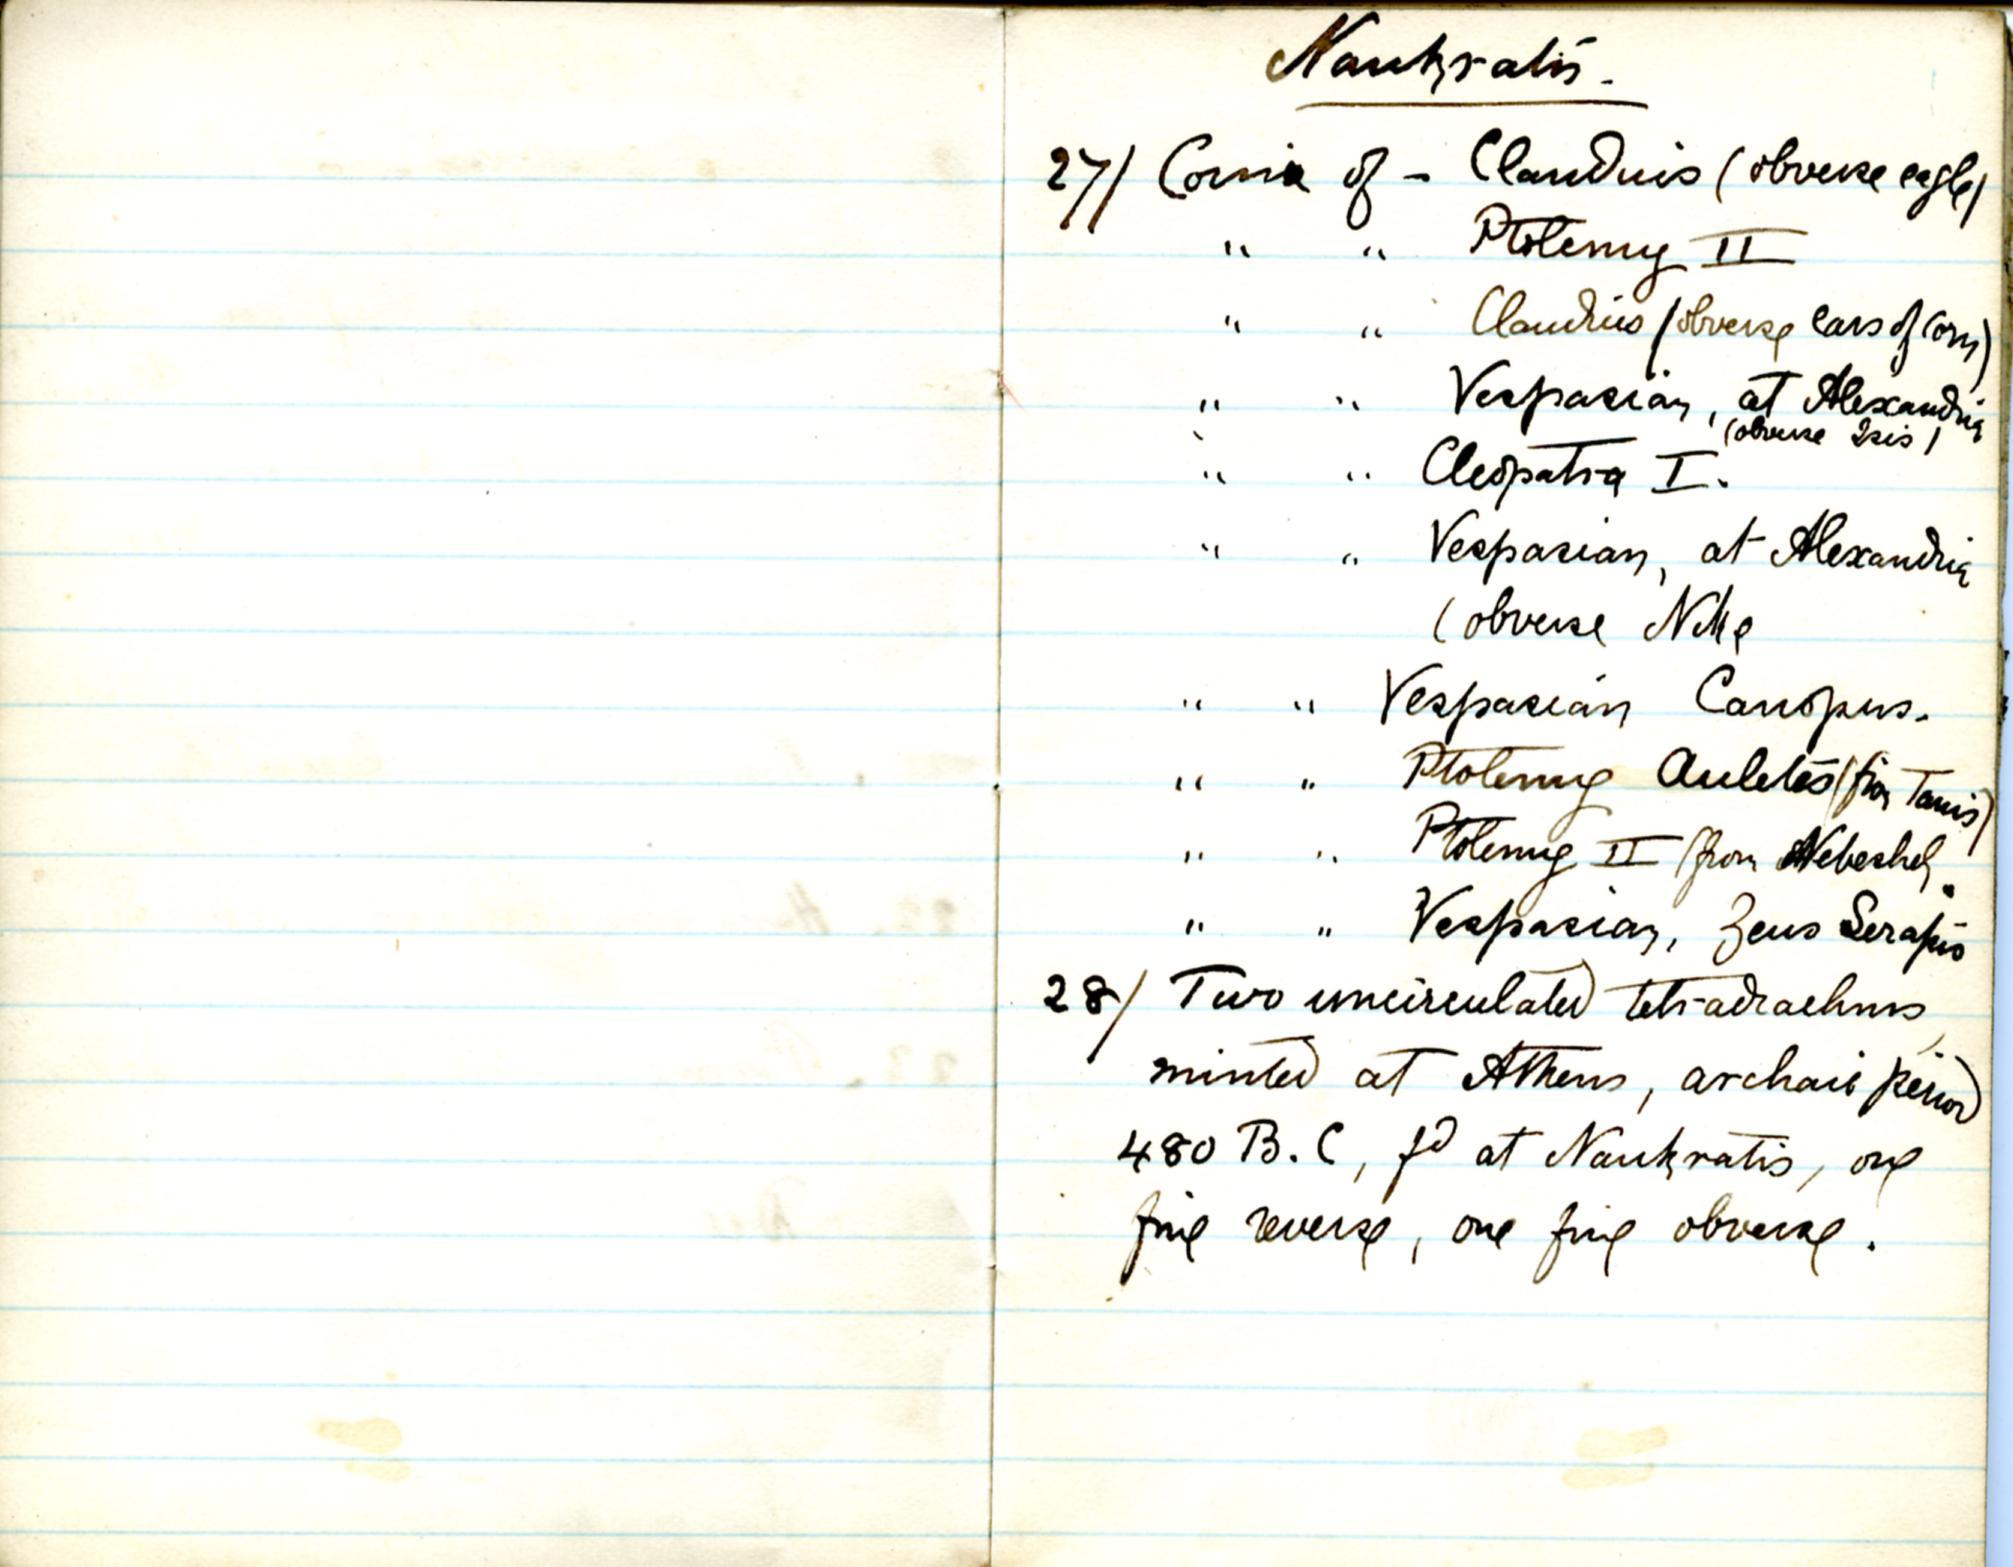 1884-85 Naukratis, Tanis, Bubastis, Tell el-Yahudiya, Nebesheh, Tell Dafana, Tell Sueilin, Tell el-Maskuta DIST.10.01d